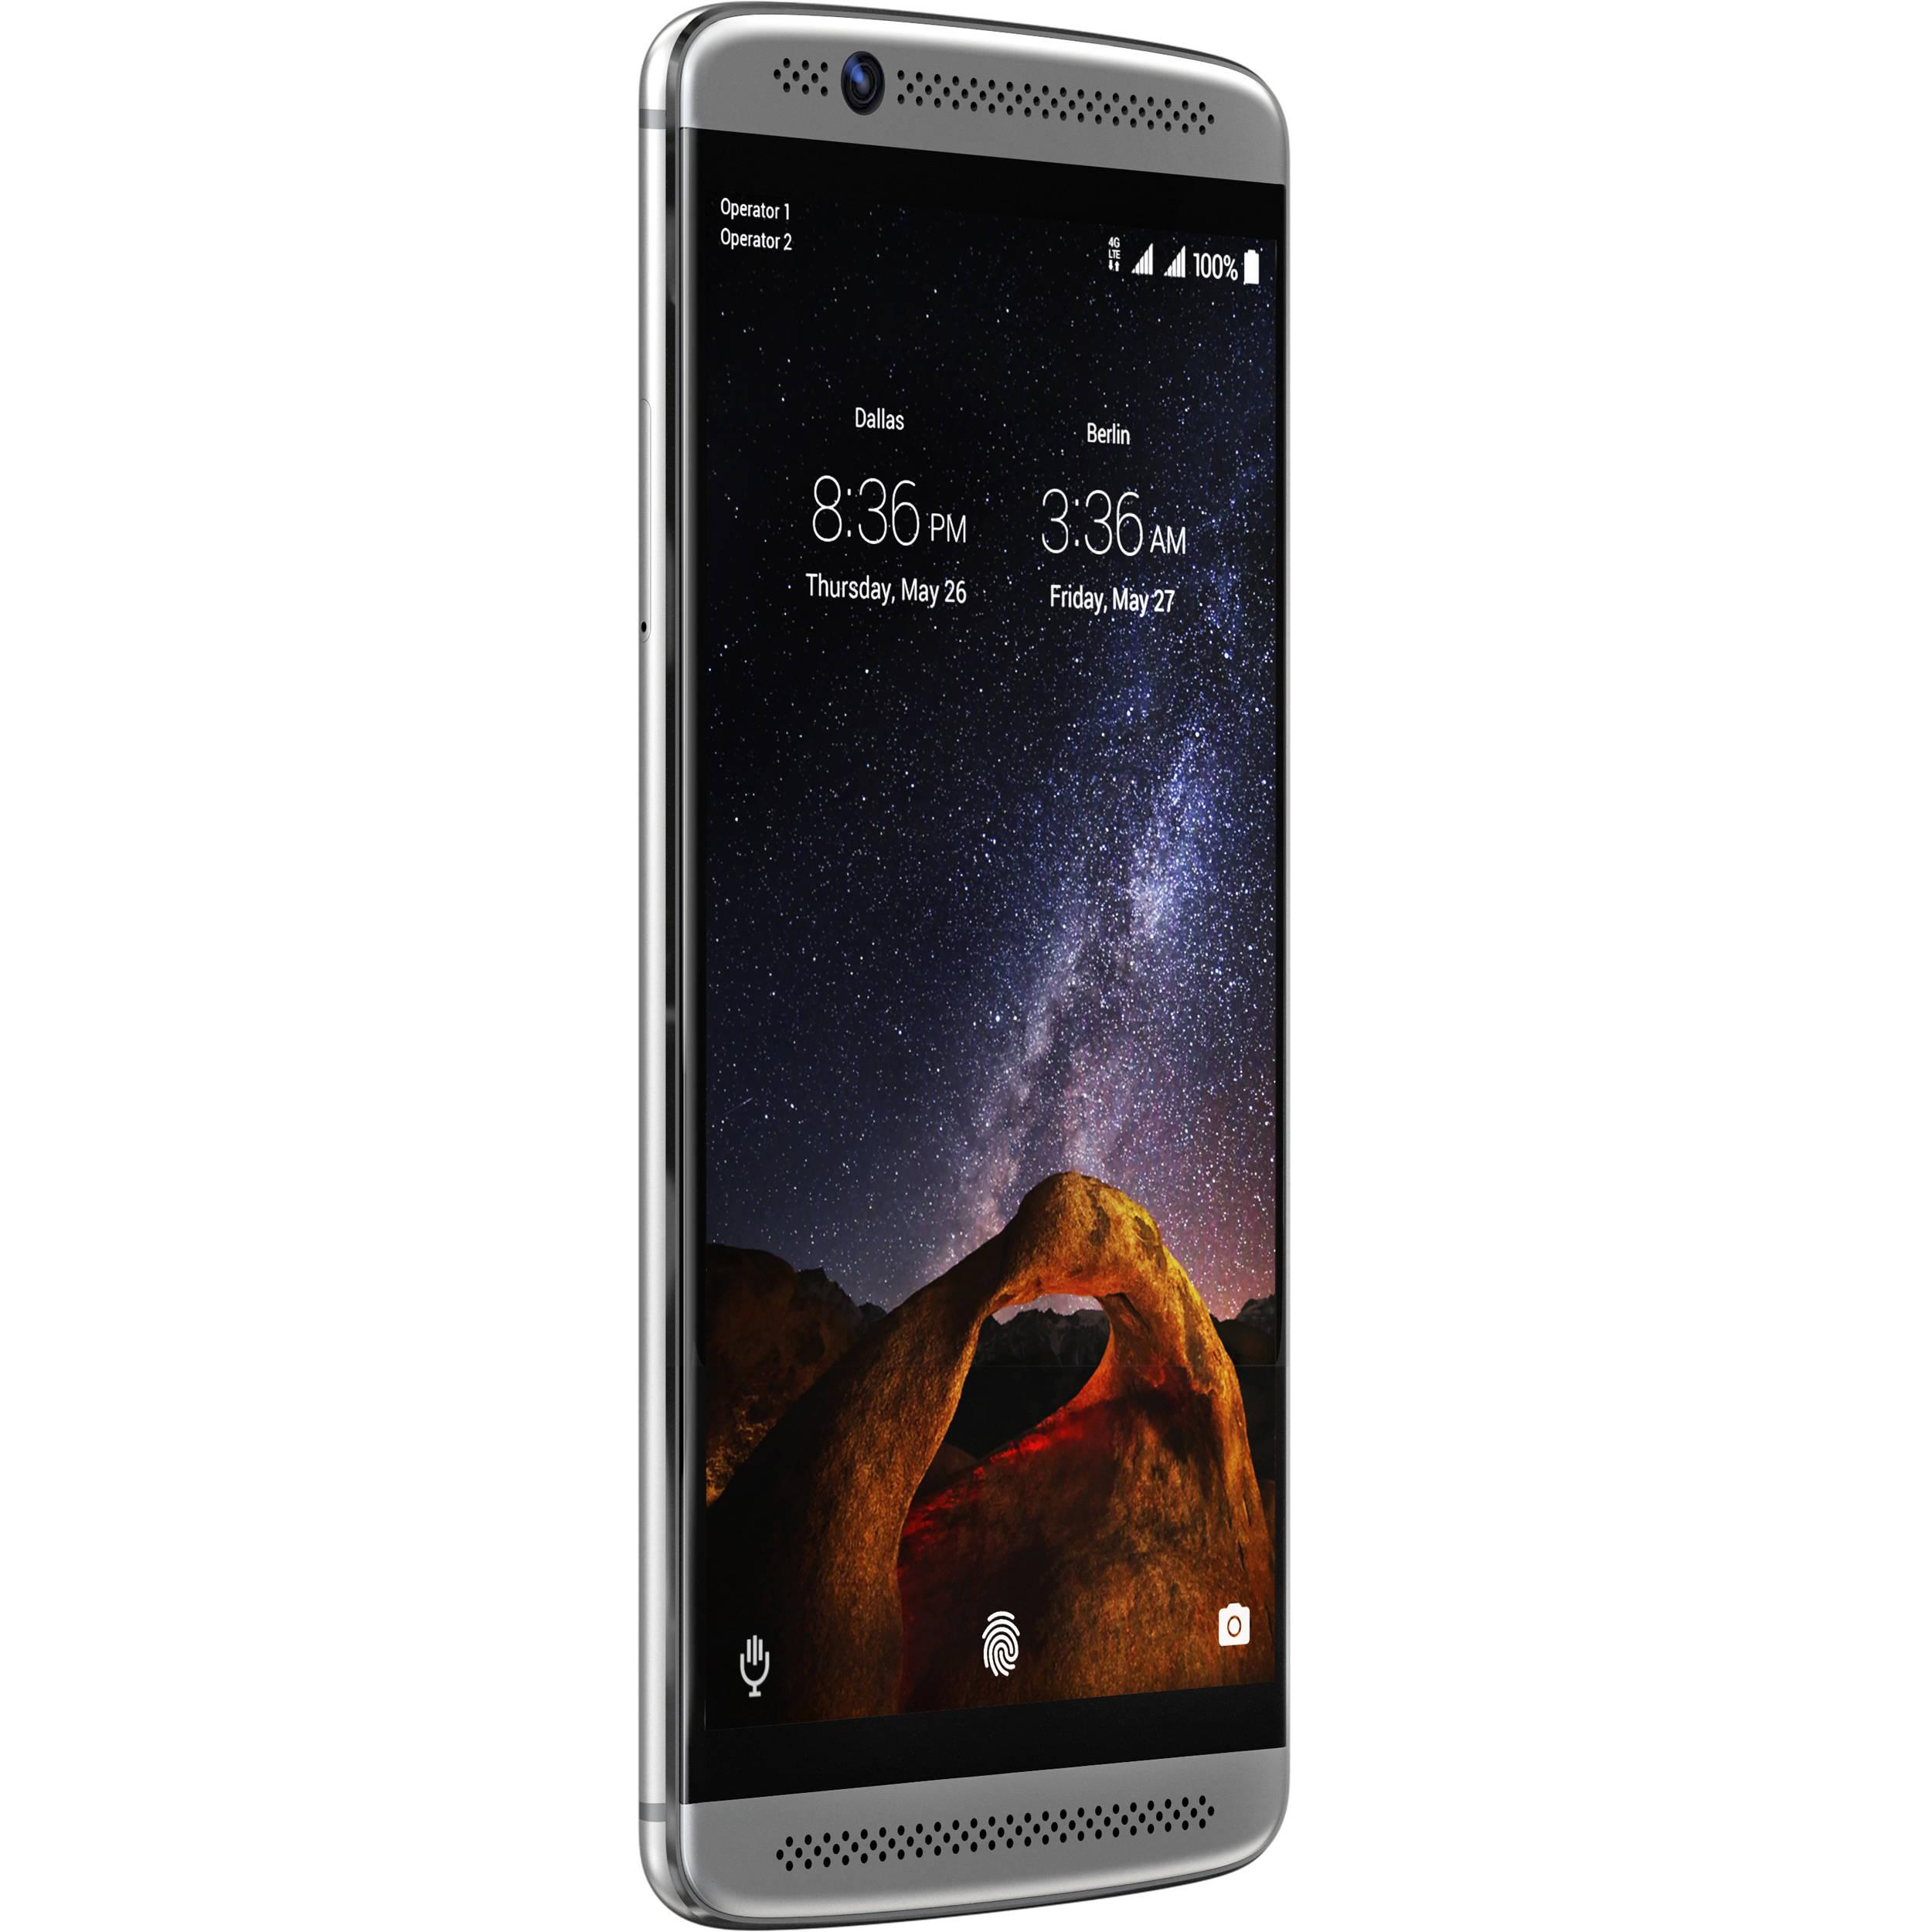 ZTE Axon 7 mini 32GB Smartphone (Unlocked, Platinum Gray)